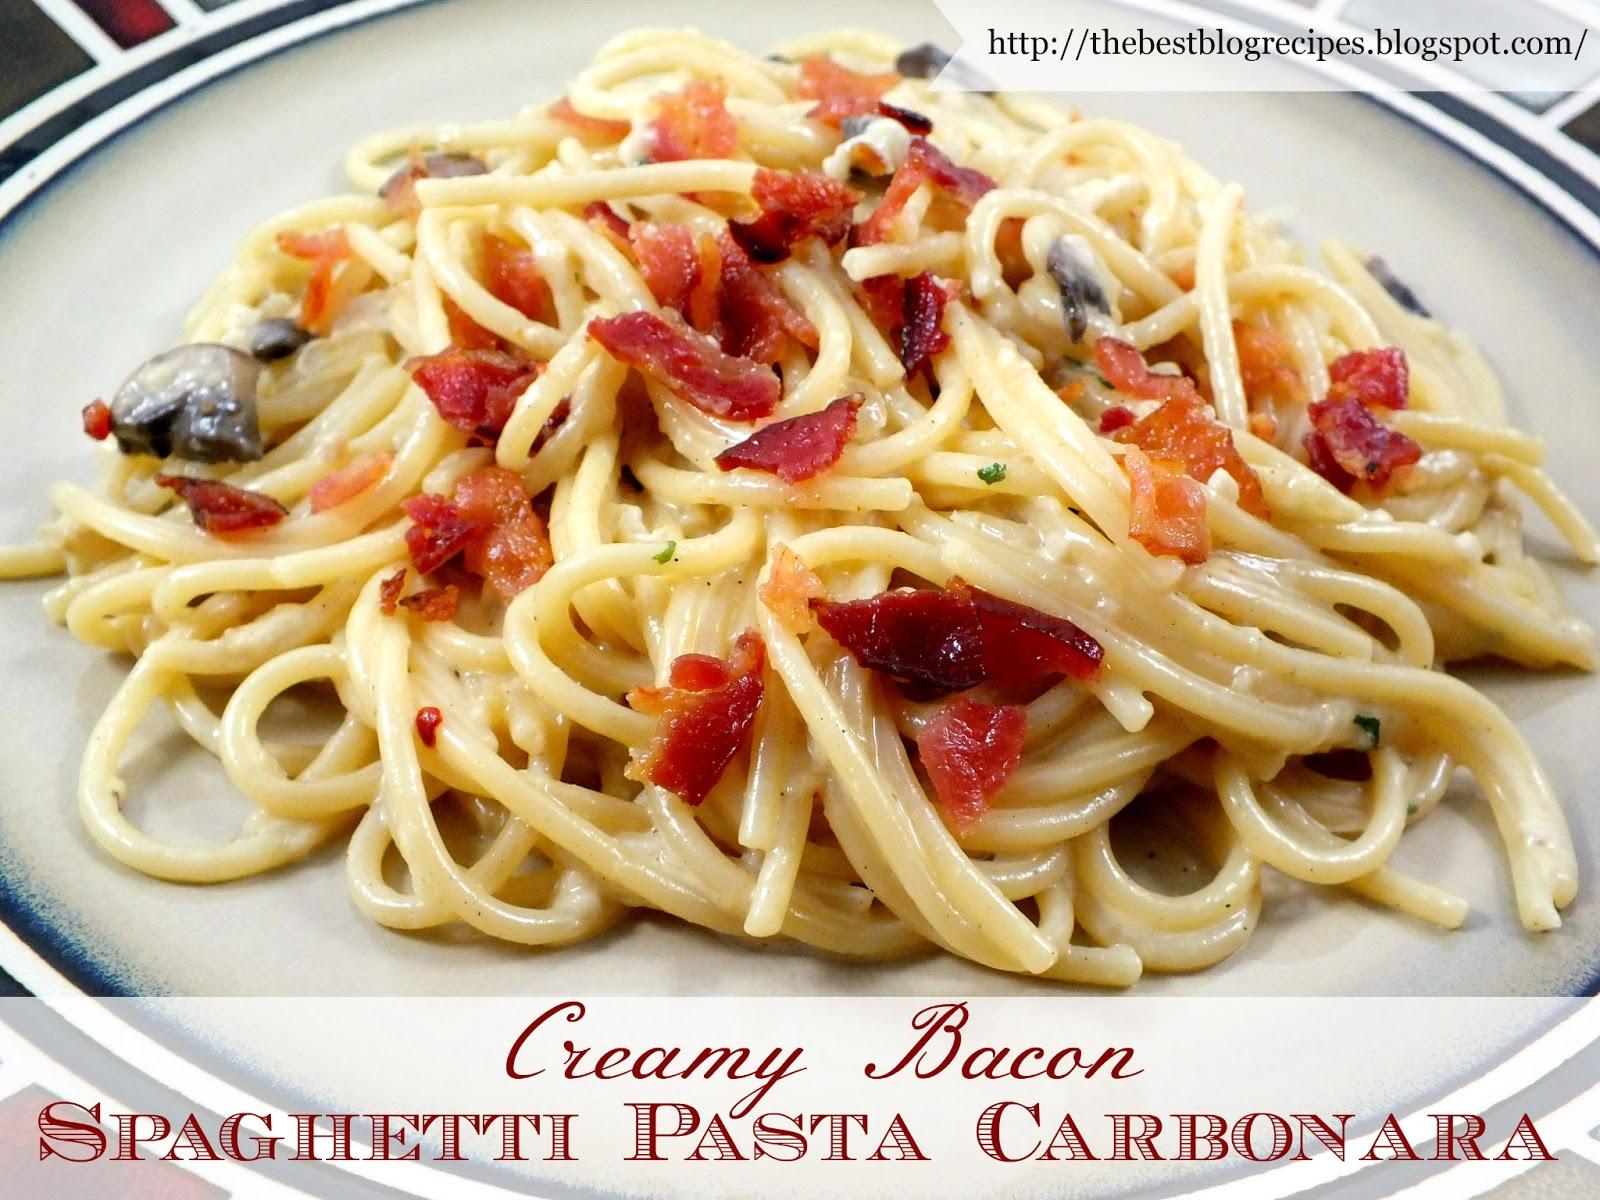 Pasta carbonara recipes easy